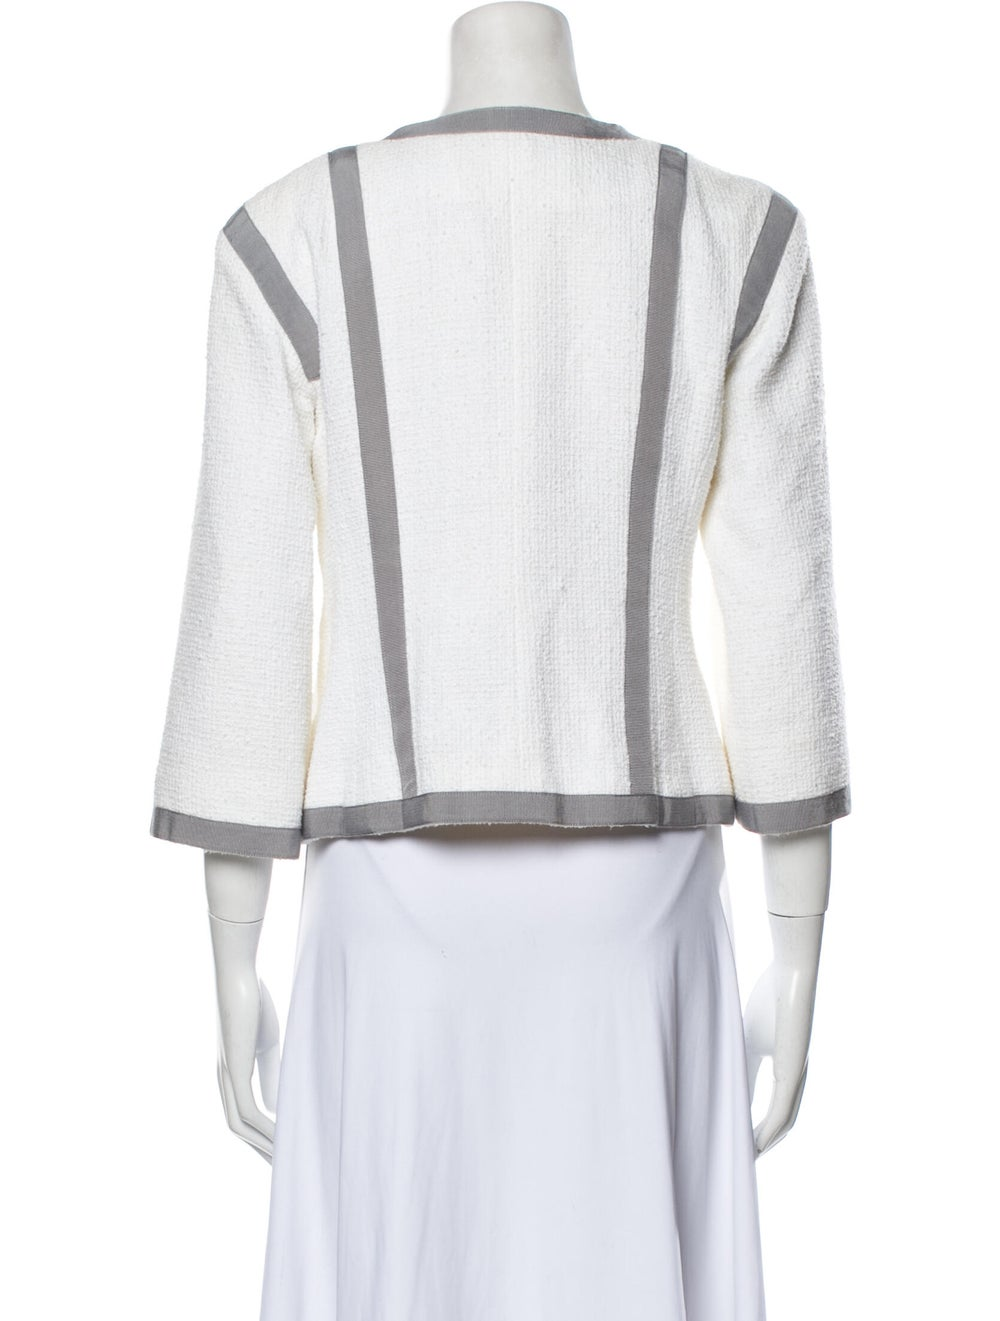 Chanel 2013 Striped Jacket - image 3